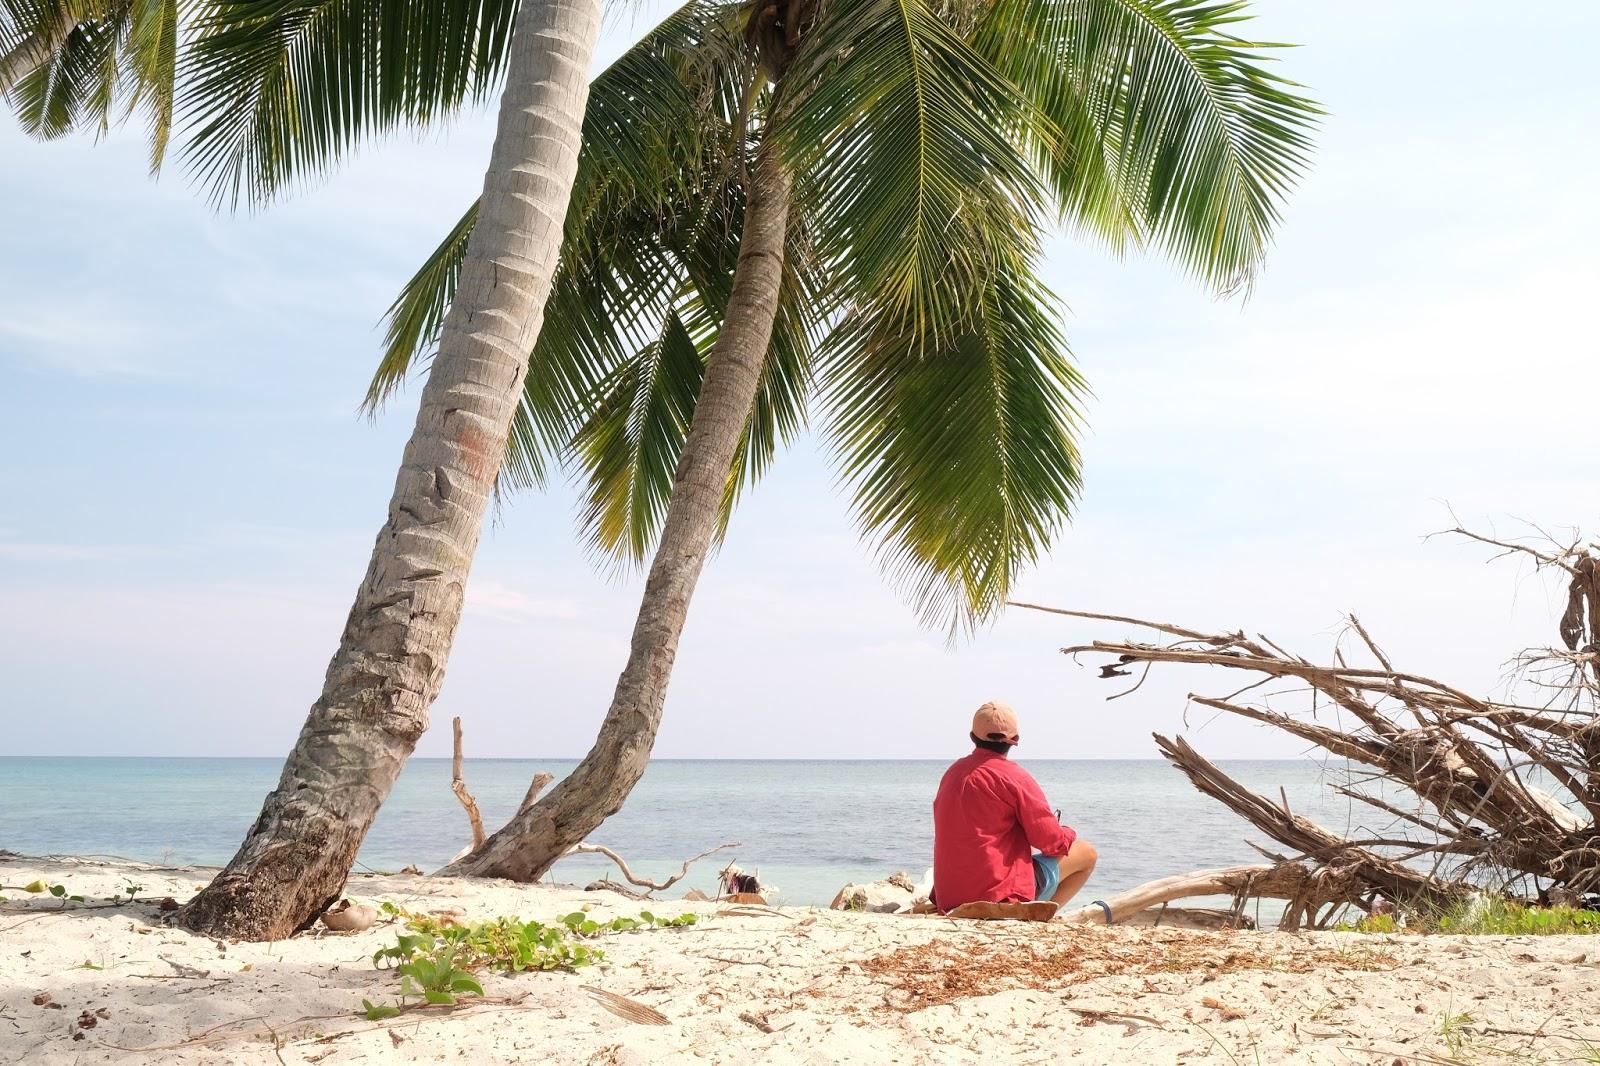 Pantai Palippis Keren Sulbar Mulai Tenar Kembali Sulawesi Kab Polewali